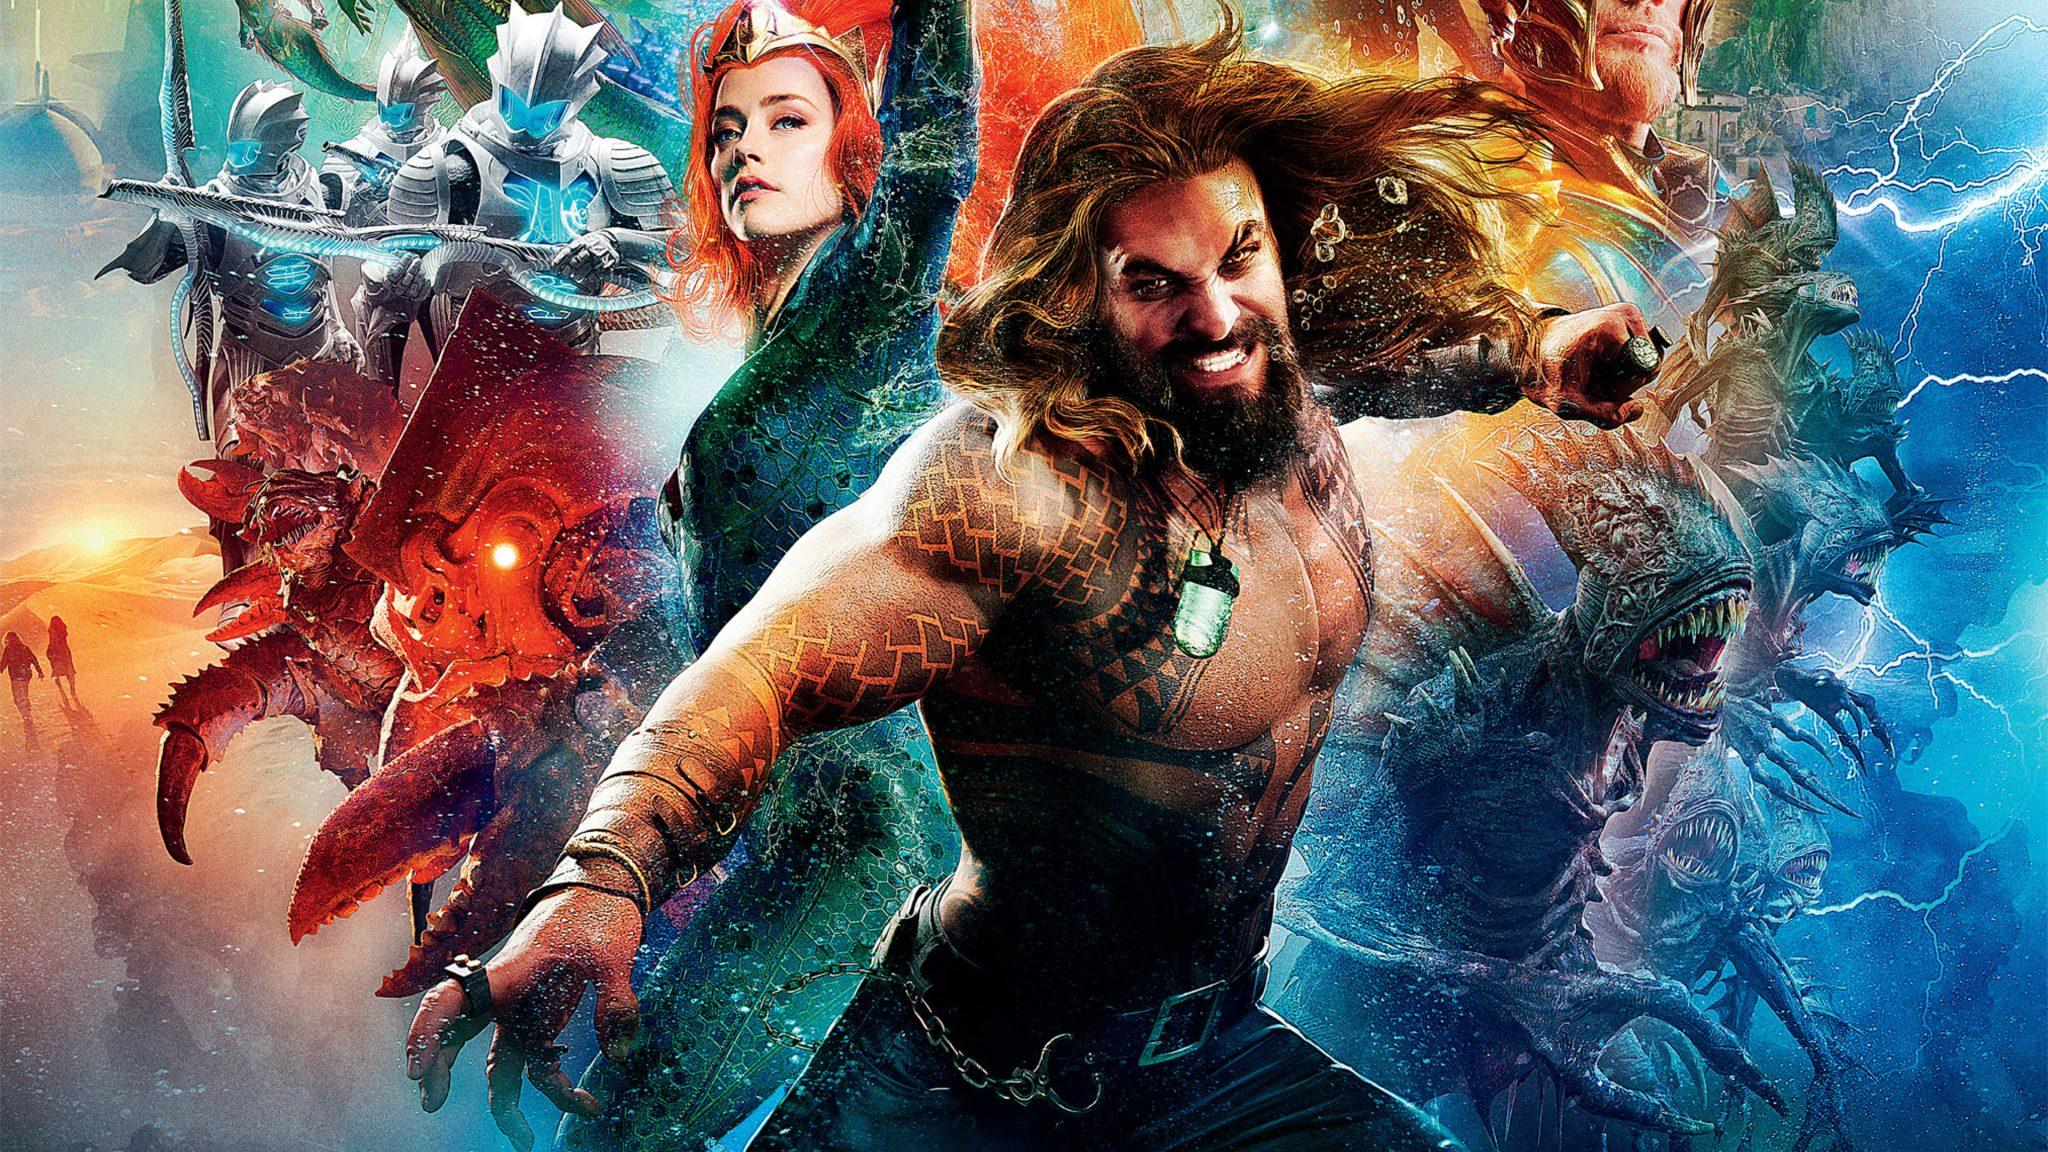 Aquaman 2018 Movie 4k Wallpapers: Aquaman 2018 Movie Poster 4K Wallpaper